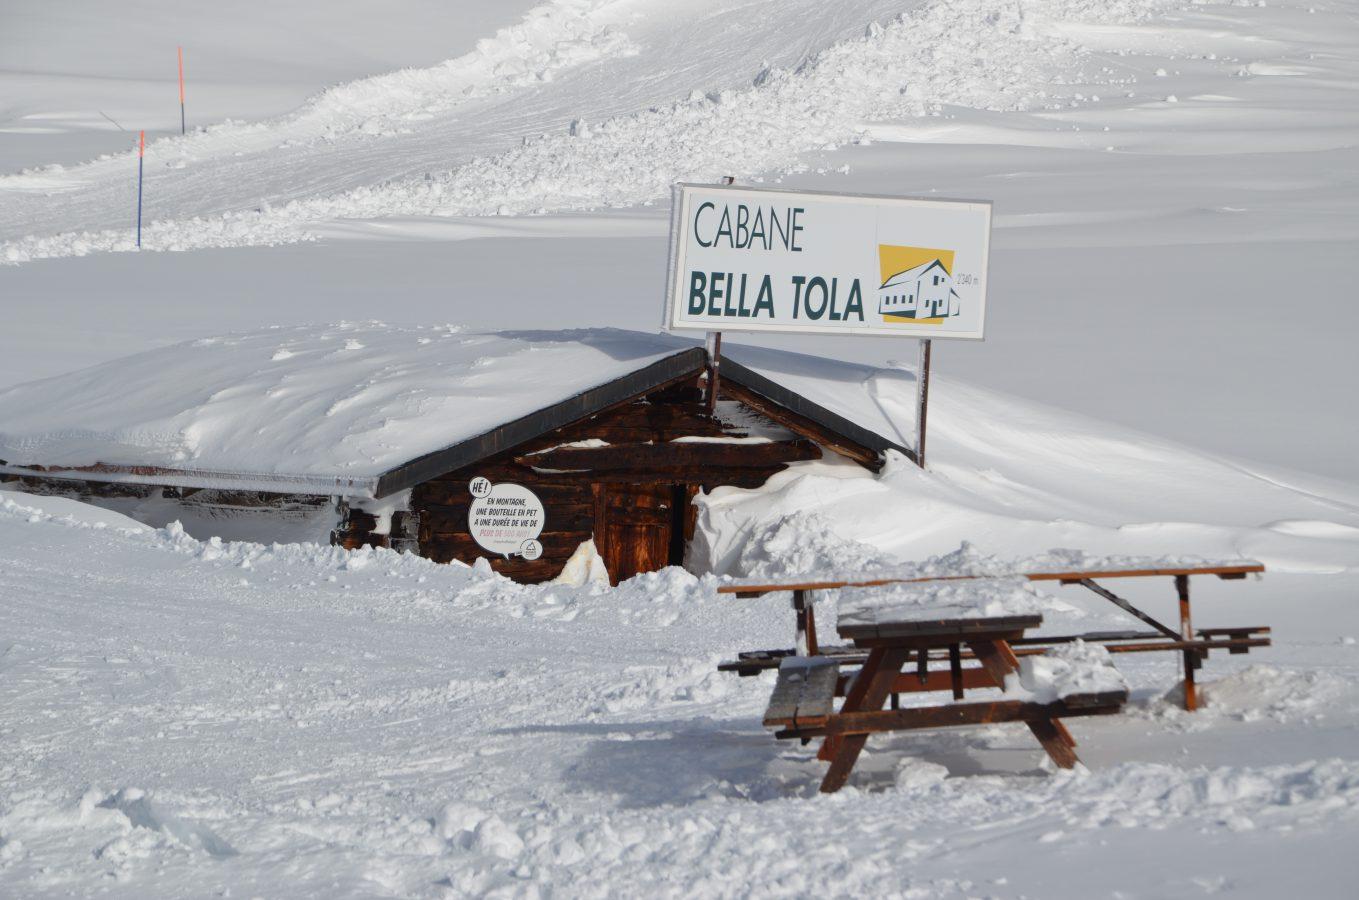 stlucchandolin-23janvier2018-dependance-cabane-bella-tola